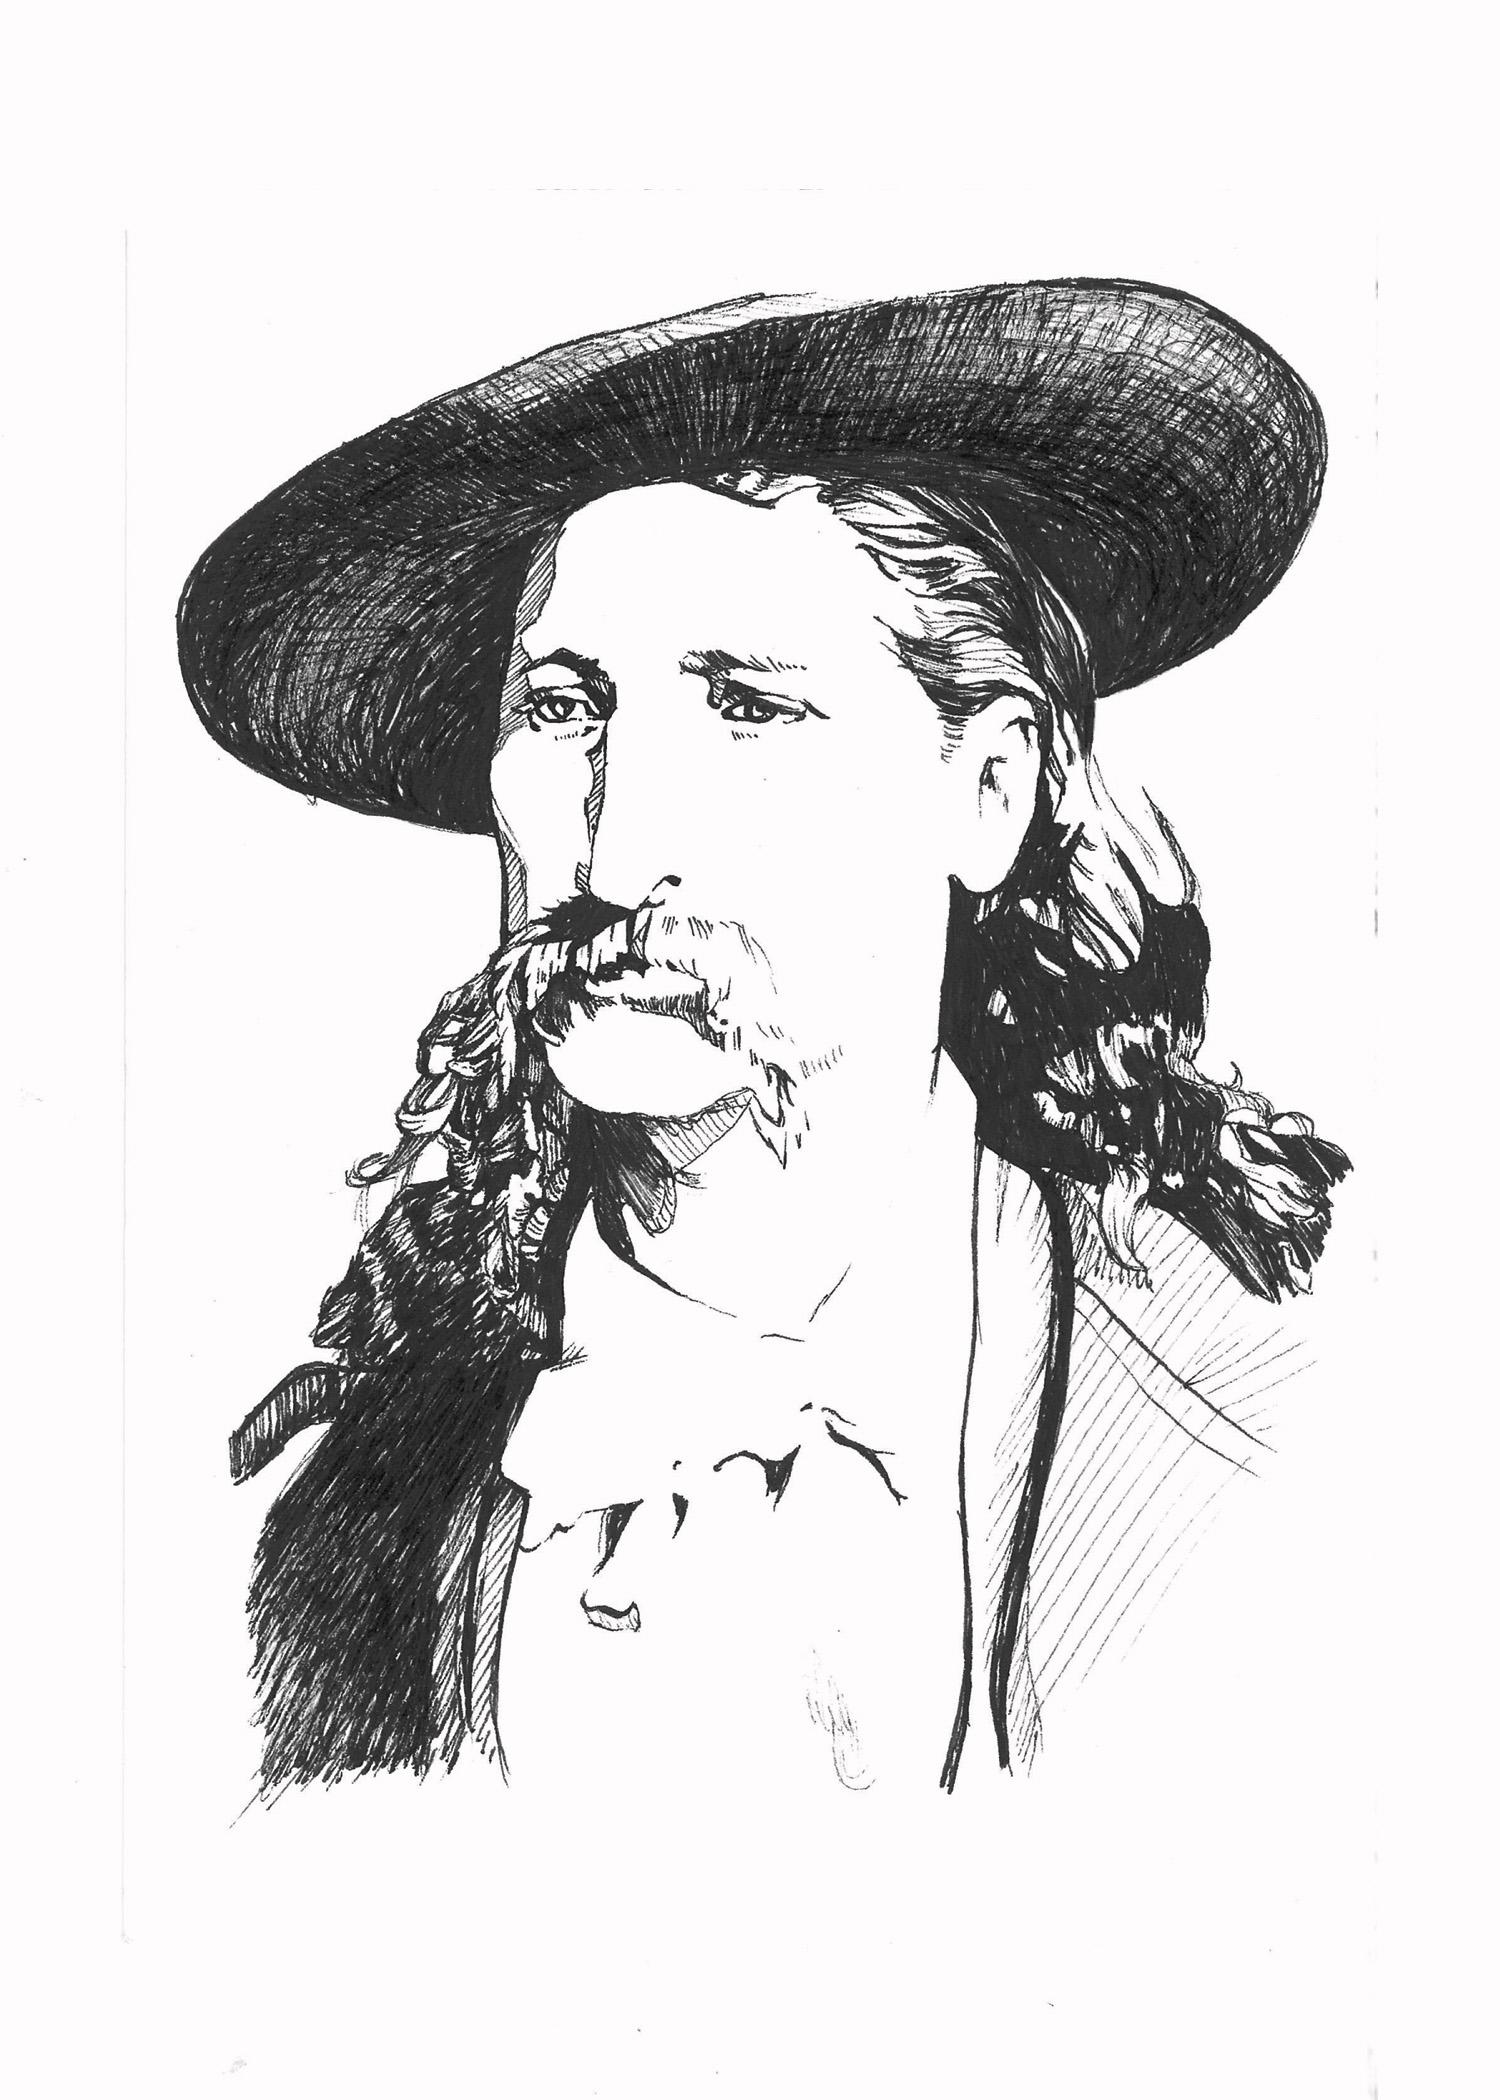 Wild Bill Hickock    W E S T E R N  L A W M A N